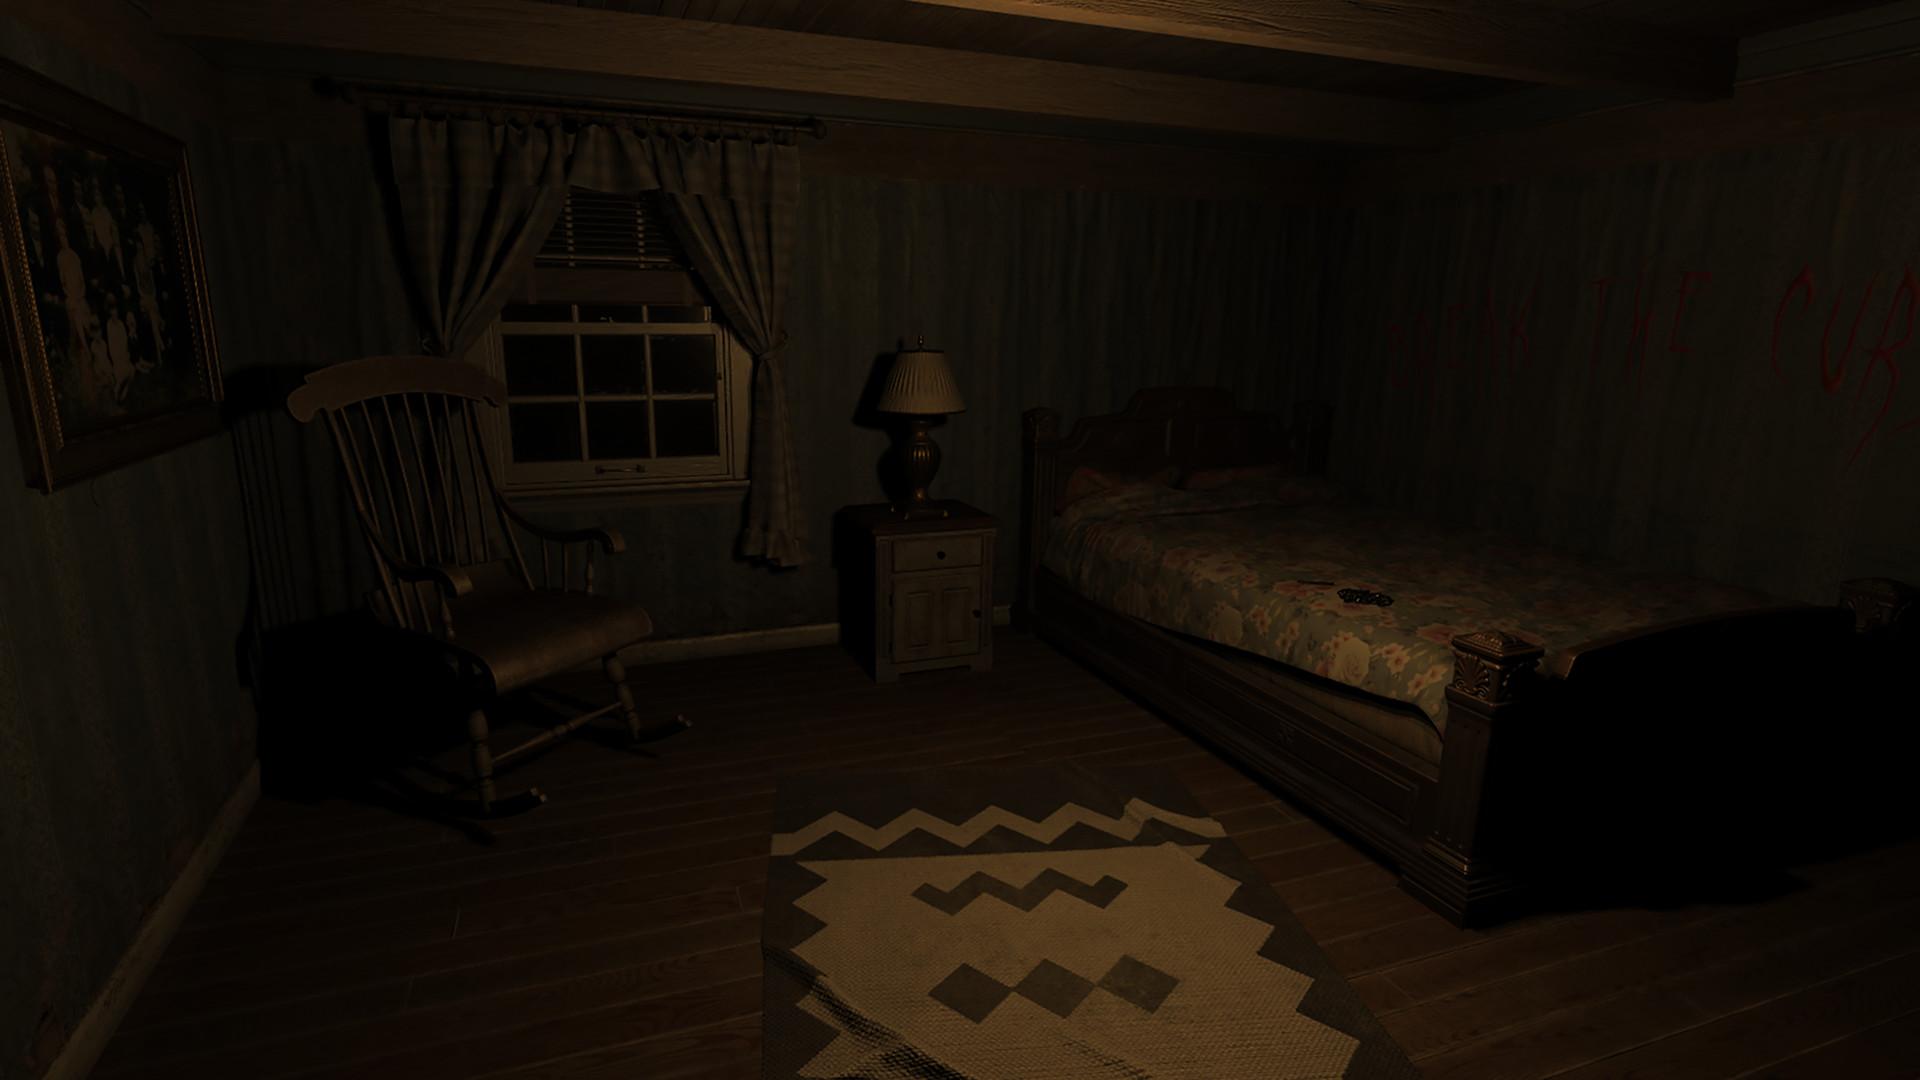 Oculus Quest 游戏《Descending 》降序I 梦魇之屋插图(2)